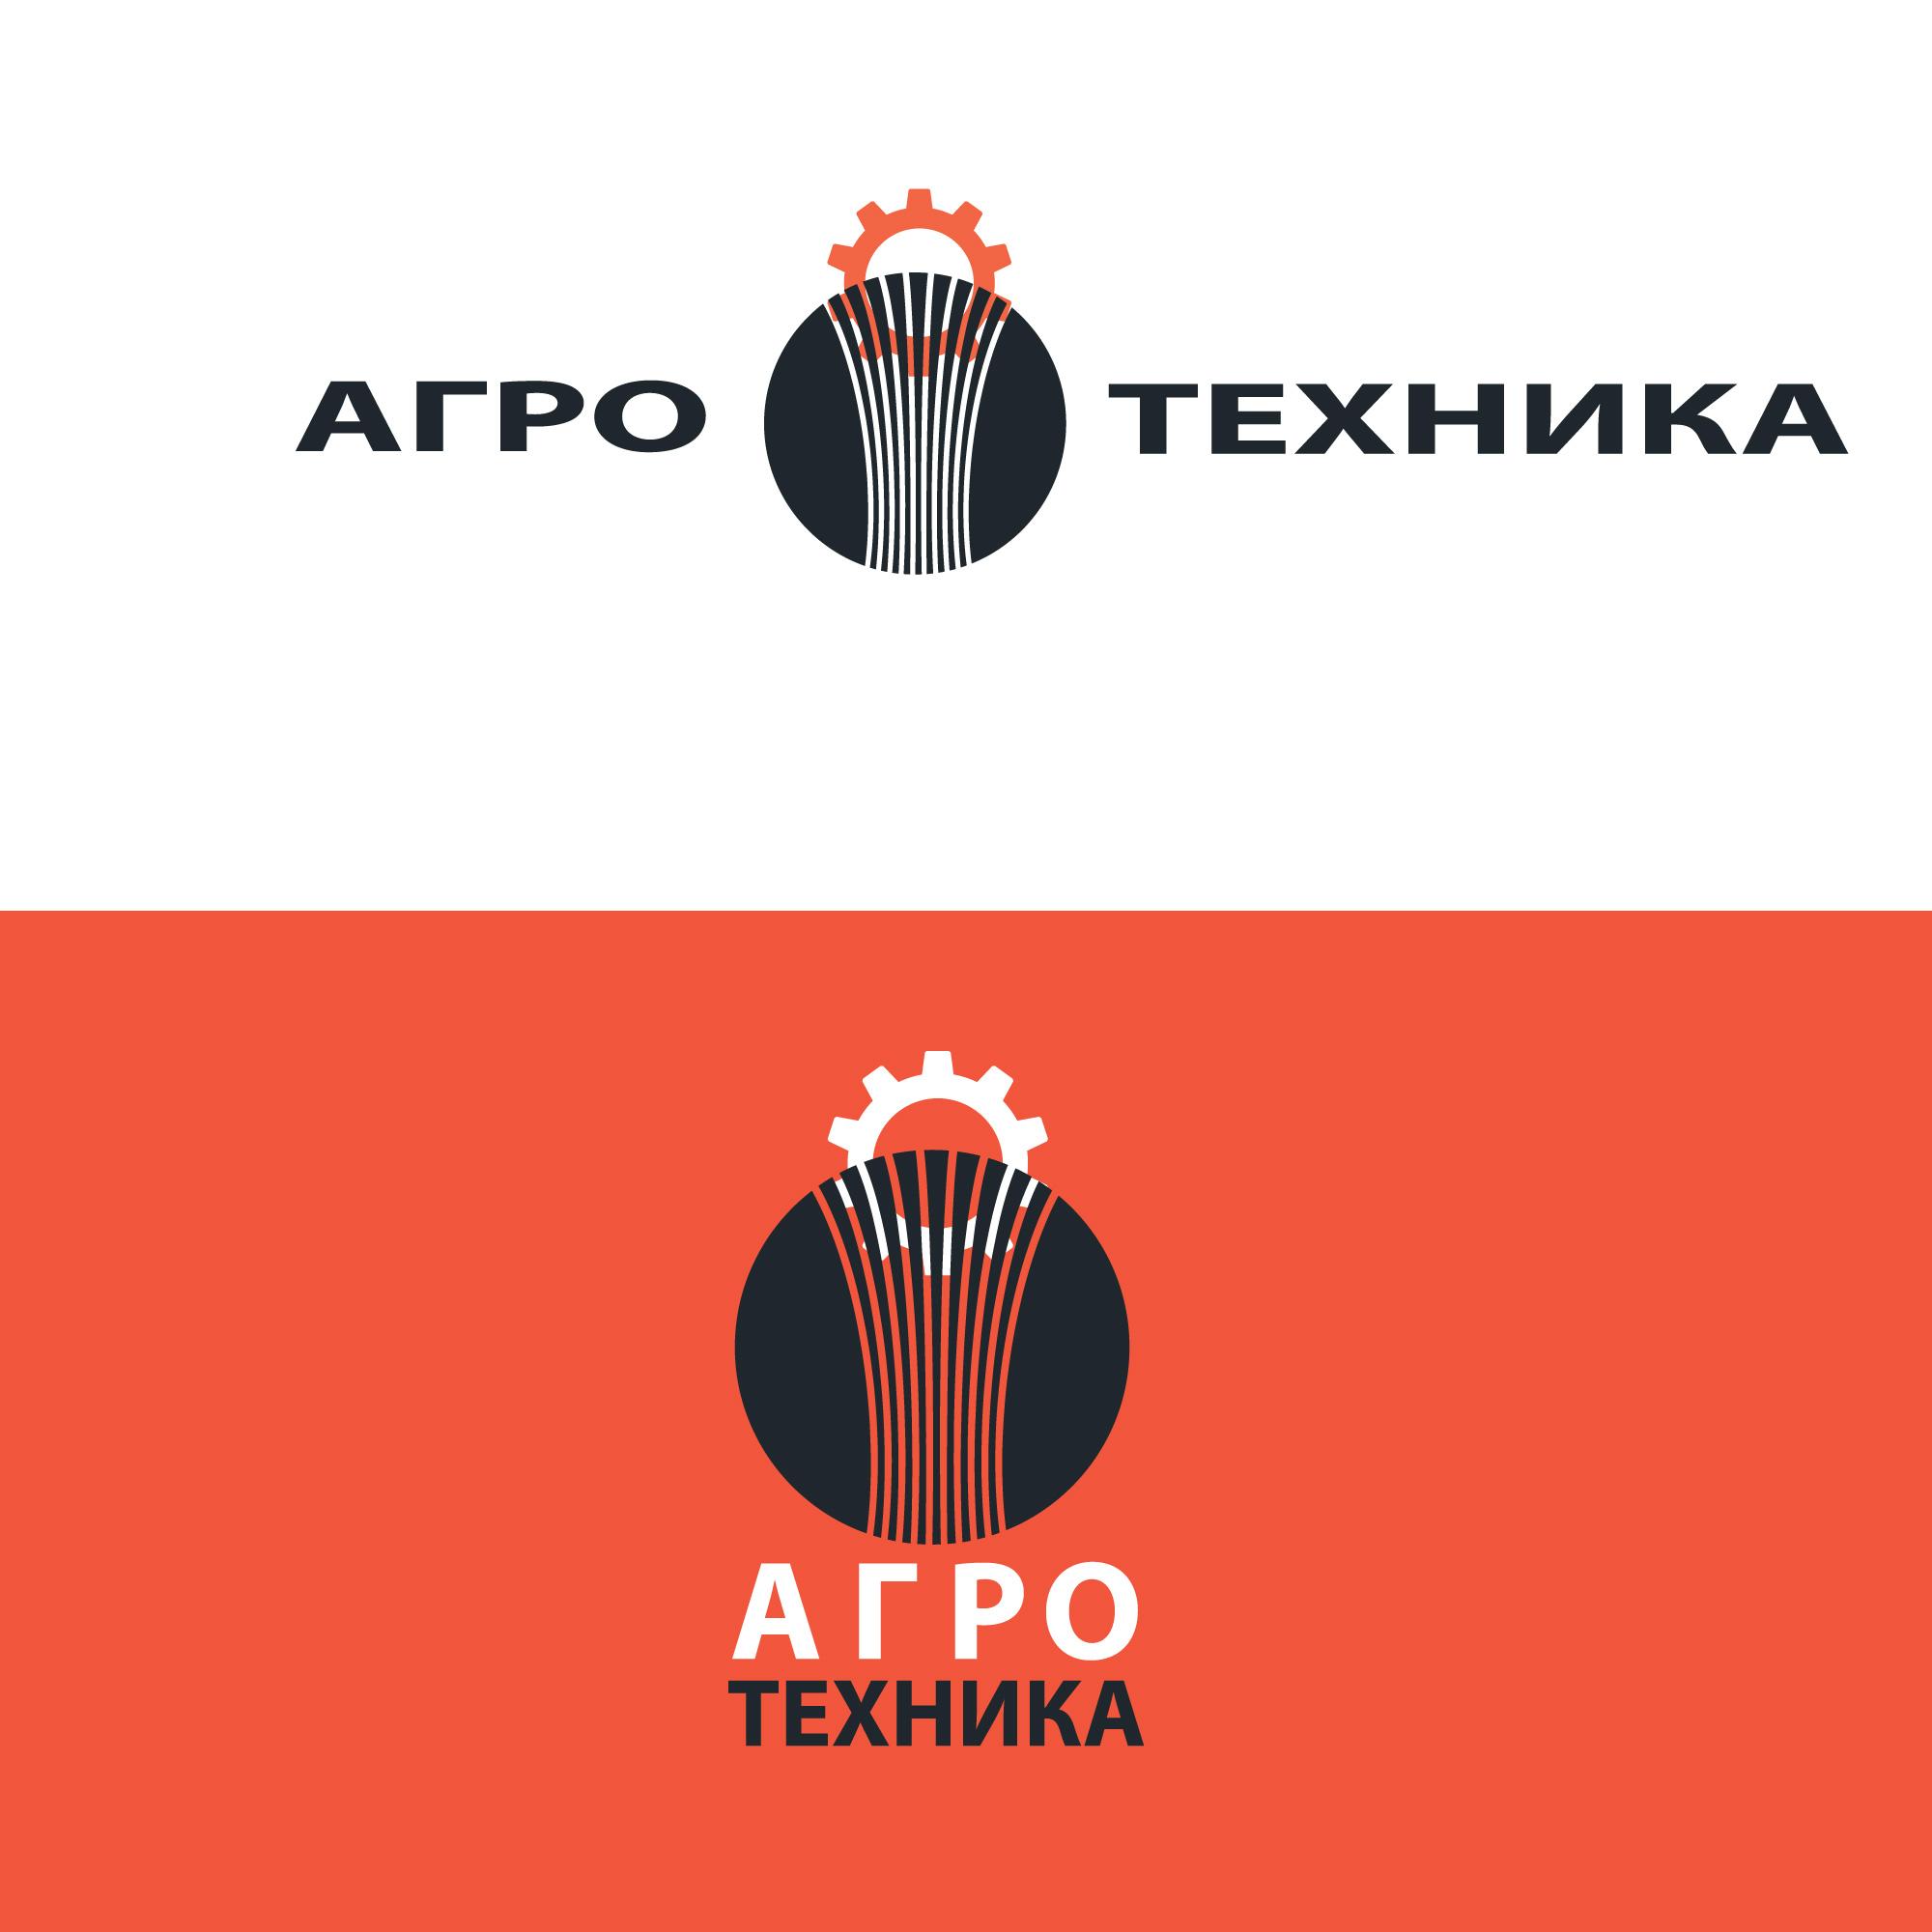 Разработка логотипа для компании Агротехника фото f_9235c0565d8bc624.jpg